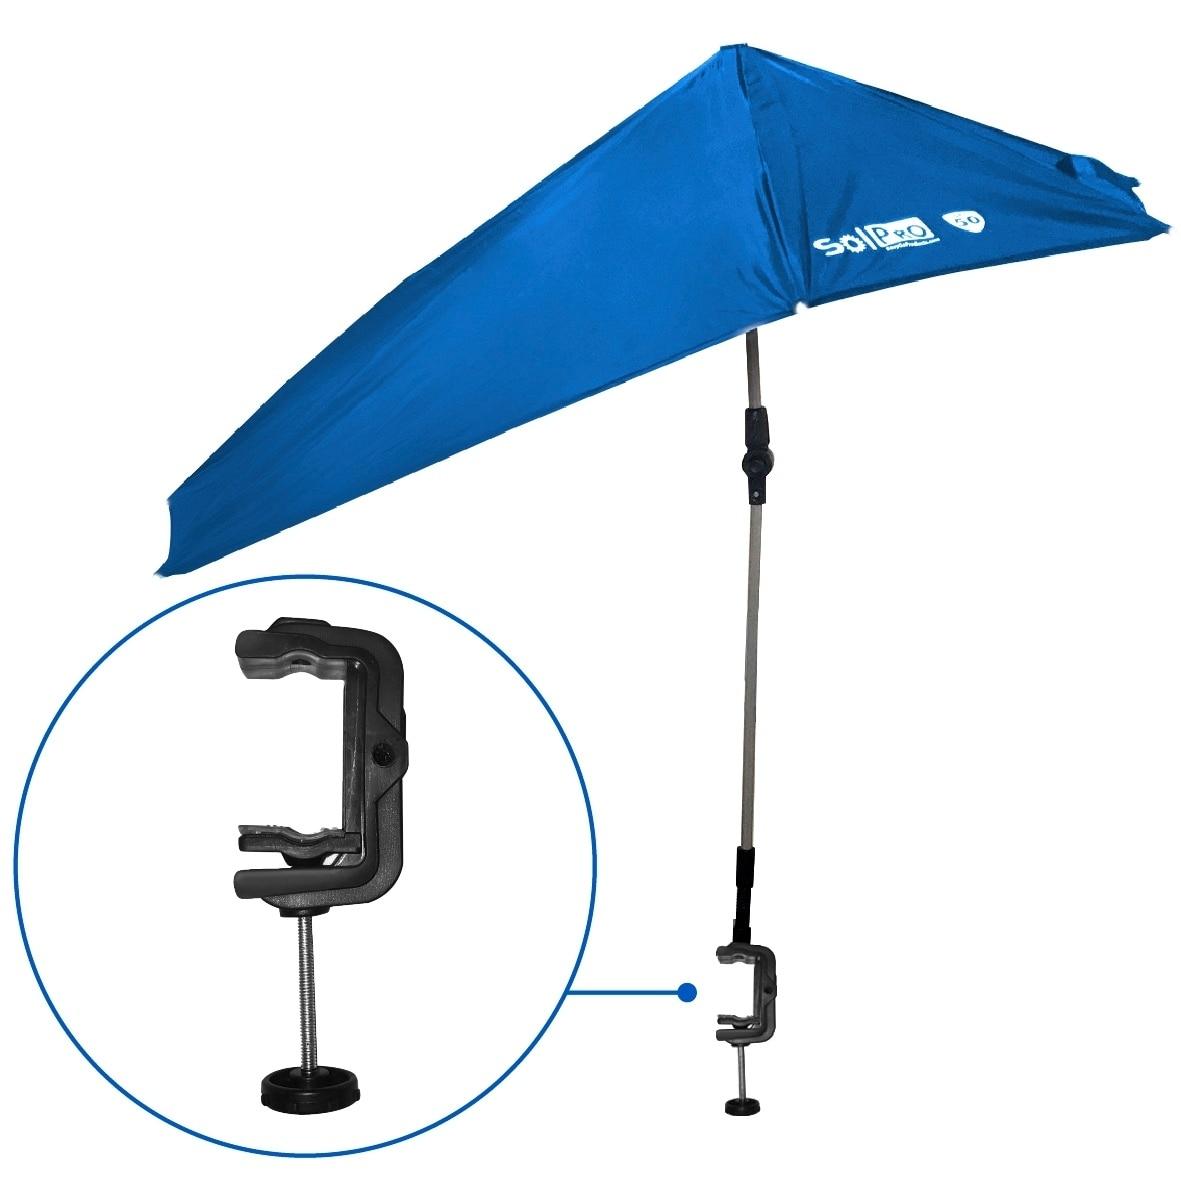 SolPro Clamp-On Shade Umbrella - 4 Way Clamp Umbrella wit...